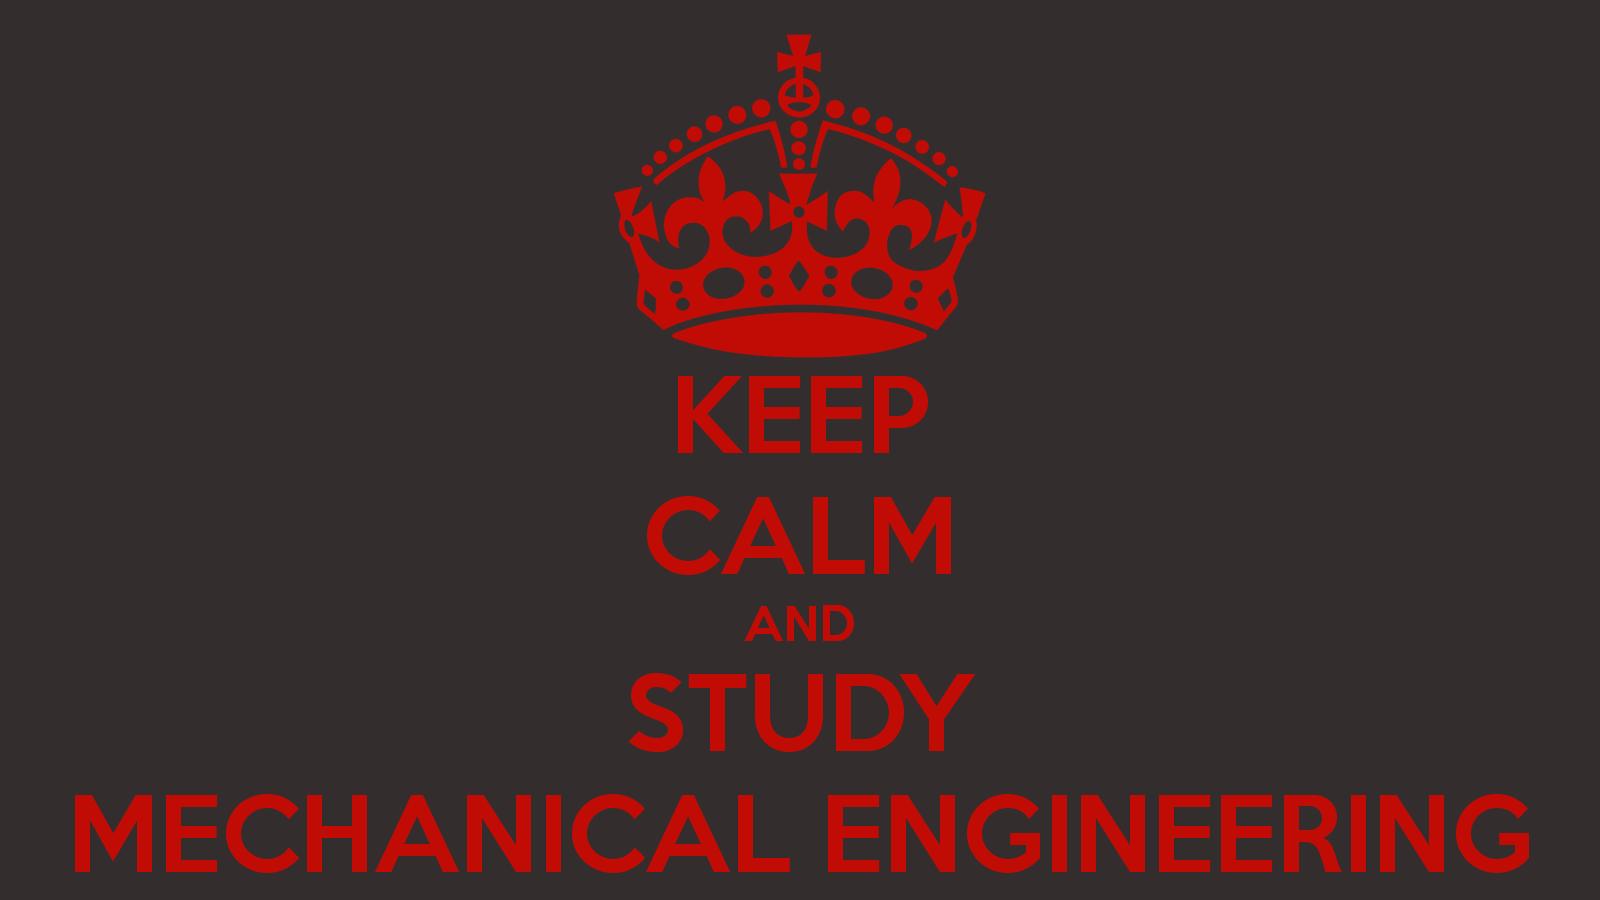 Mechanical Engineering Logo Wallpaper Mechanical eng 1600x900